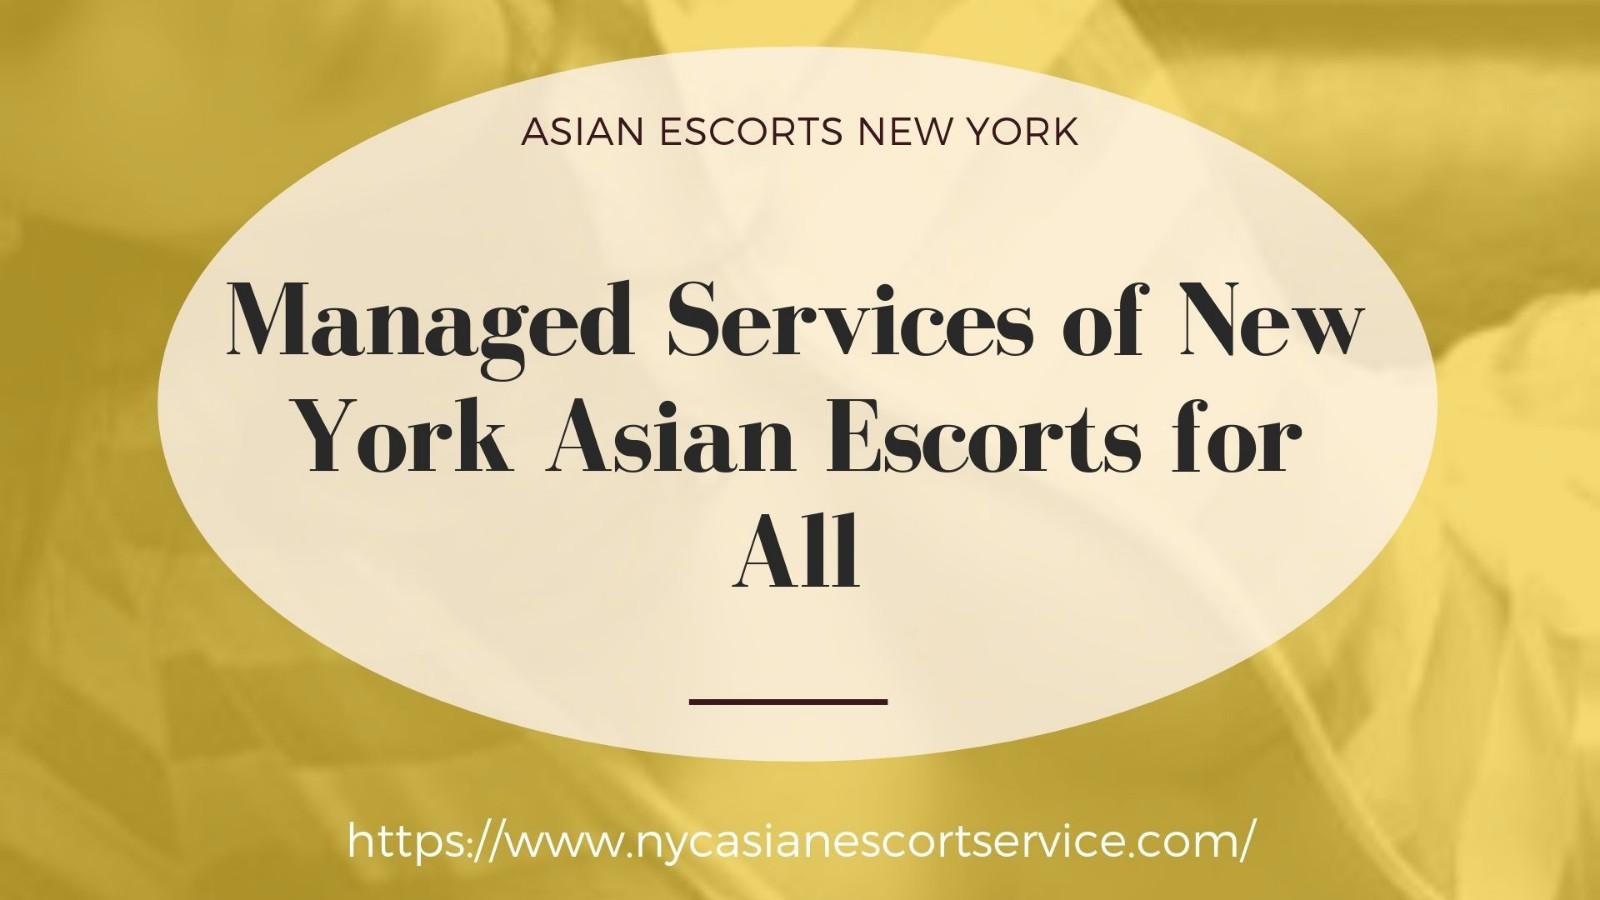 Asian escorts New York